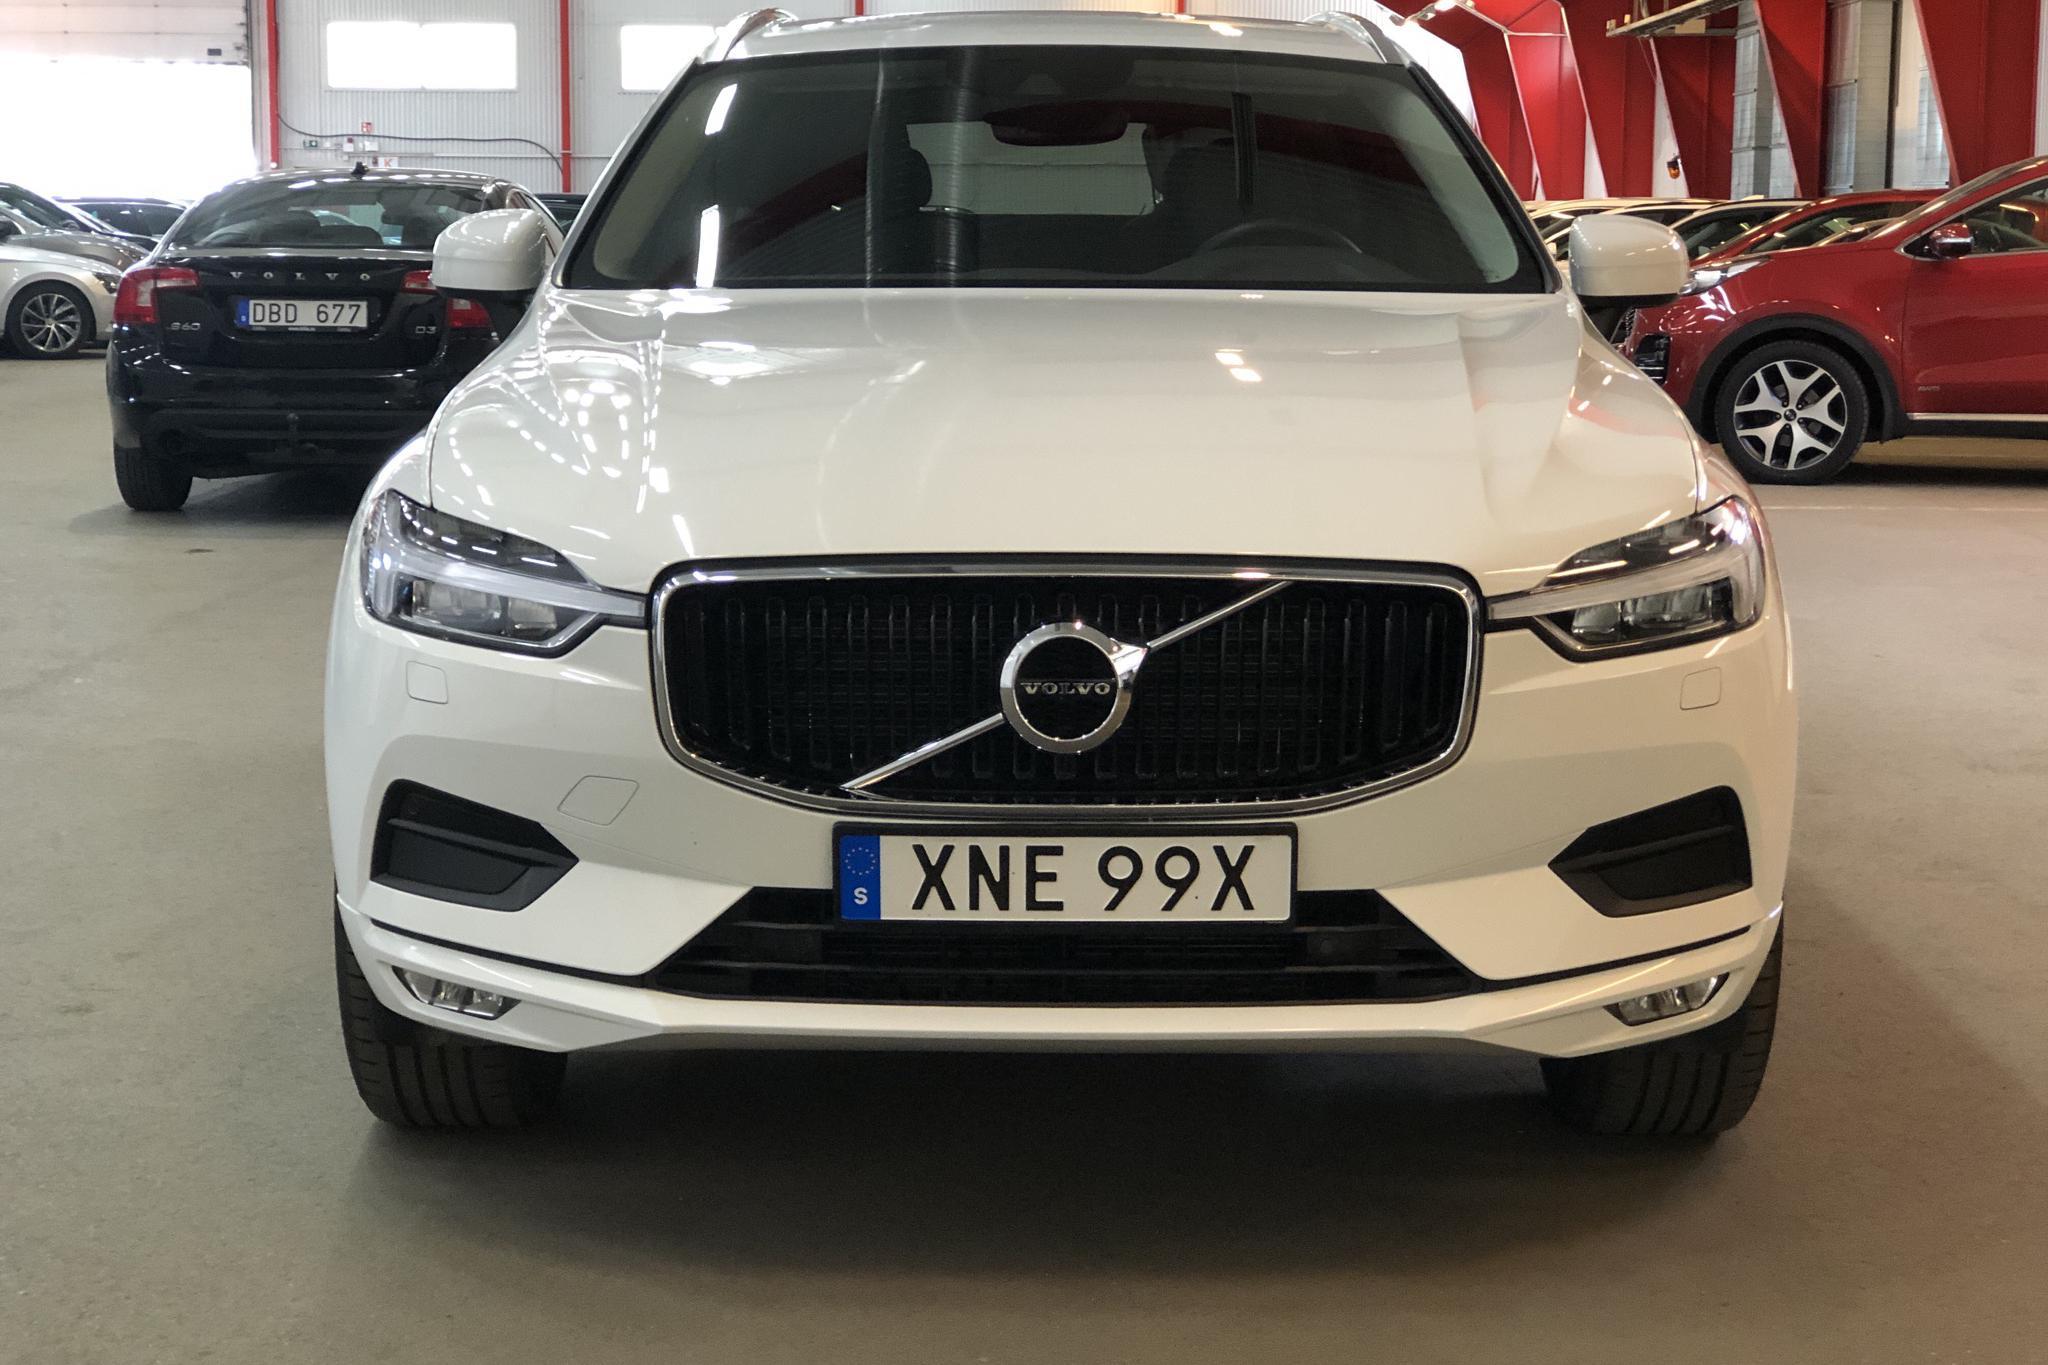 Volvo XC60 B4 AWD Mildhybrid, Diesel (197hk) - 34 230 km - Automatic - white - 2021